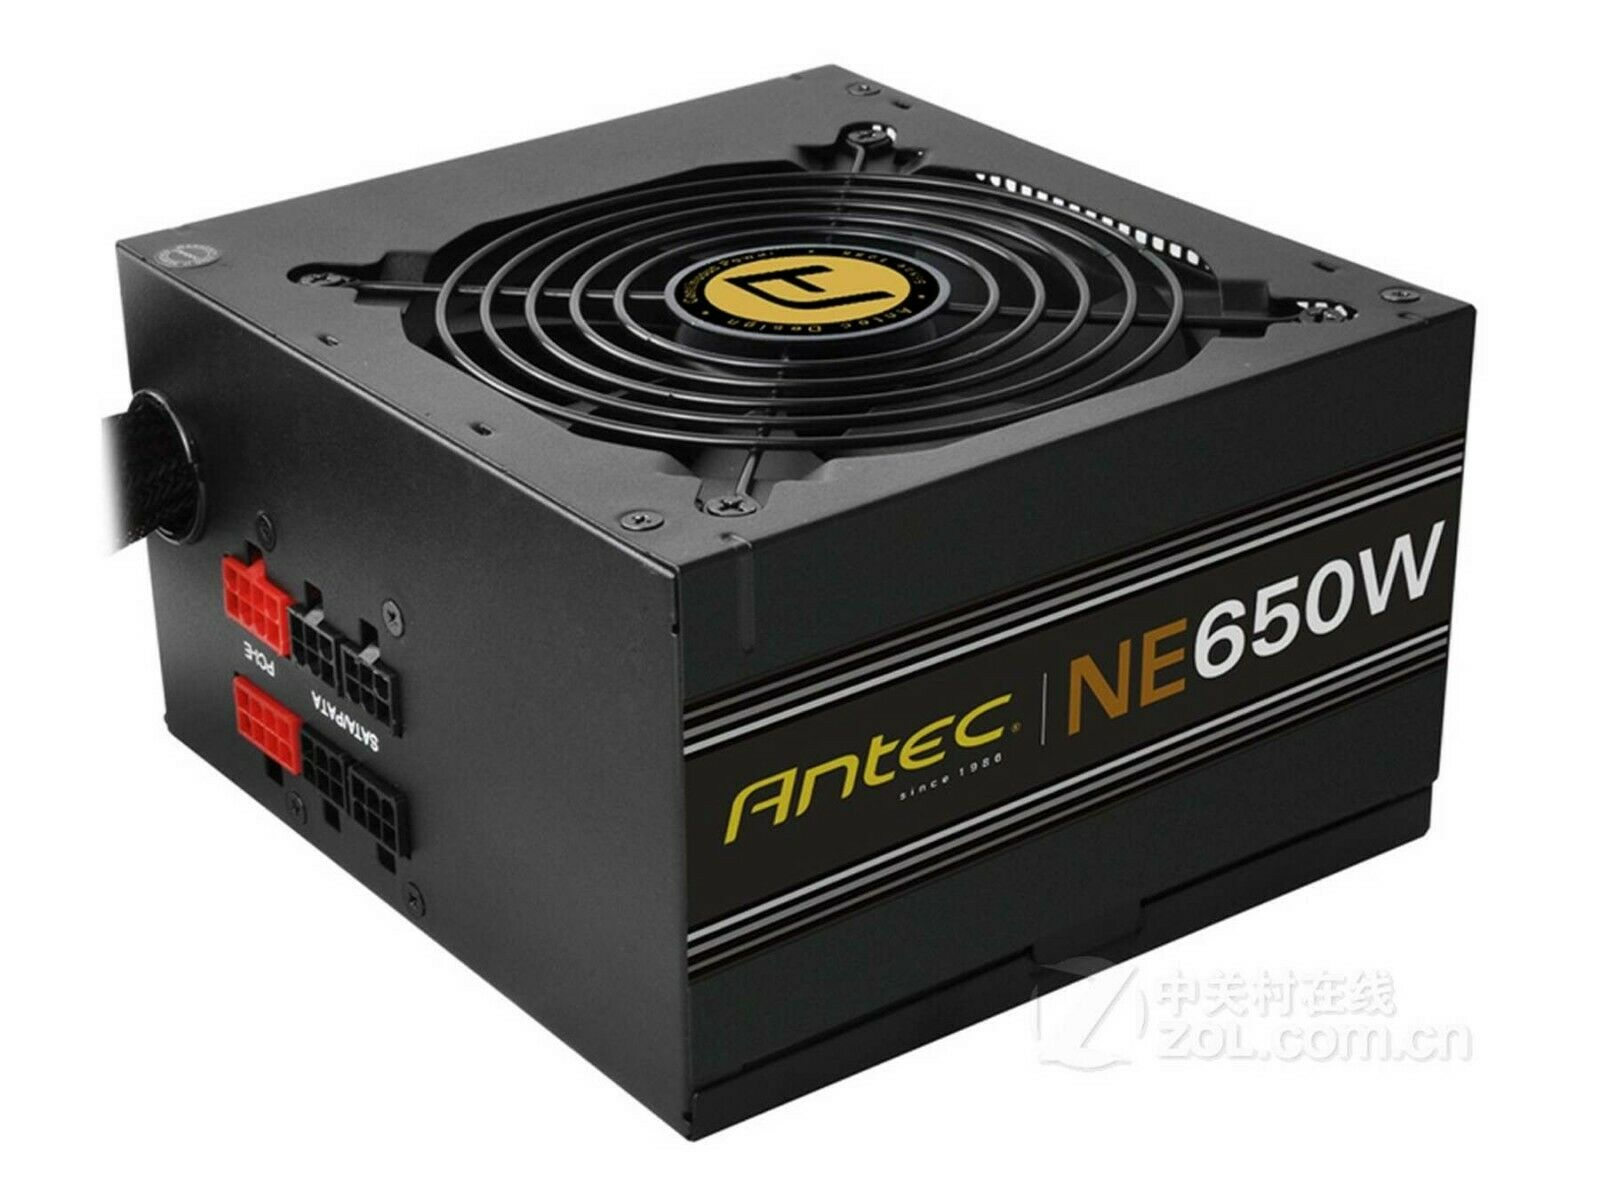 6+2pin PCI-E VGA Power Supply Cable for Antec Neo Eco 650M and GPU 50cm